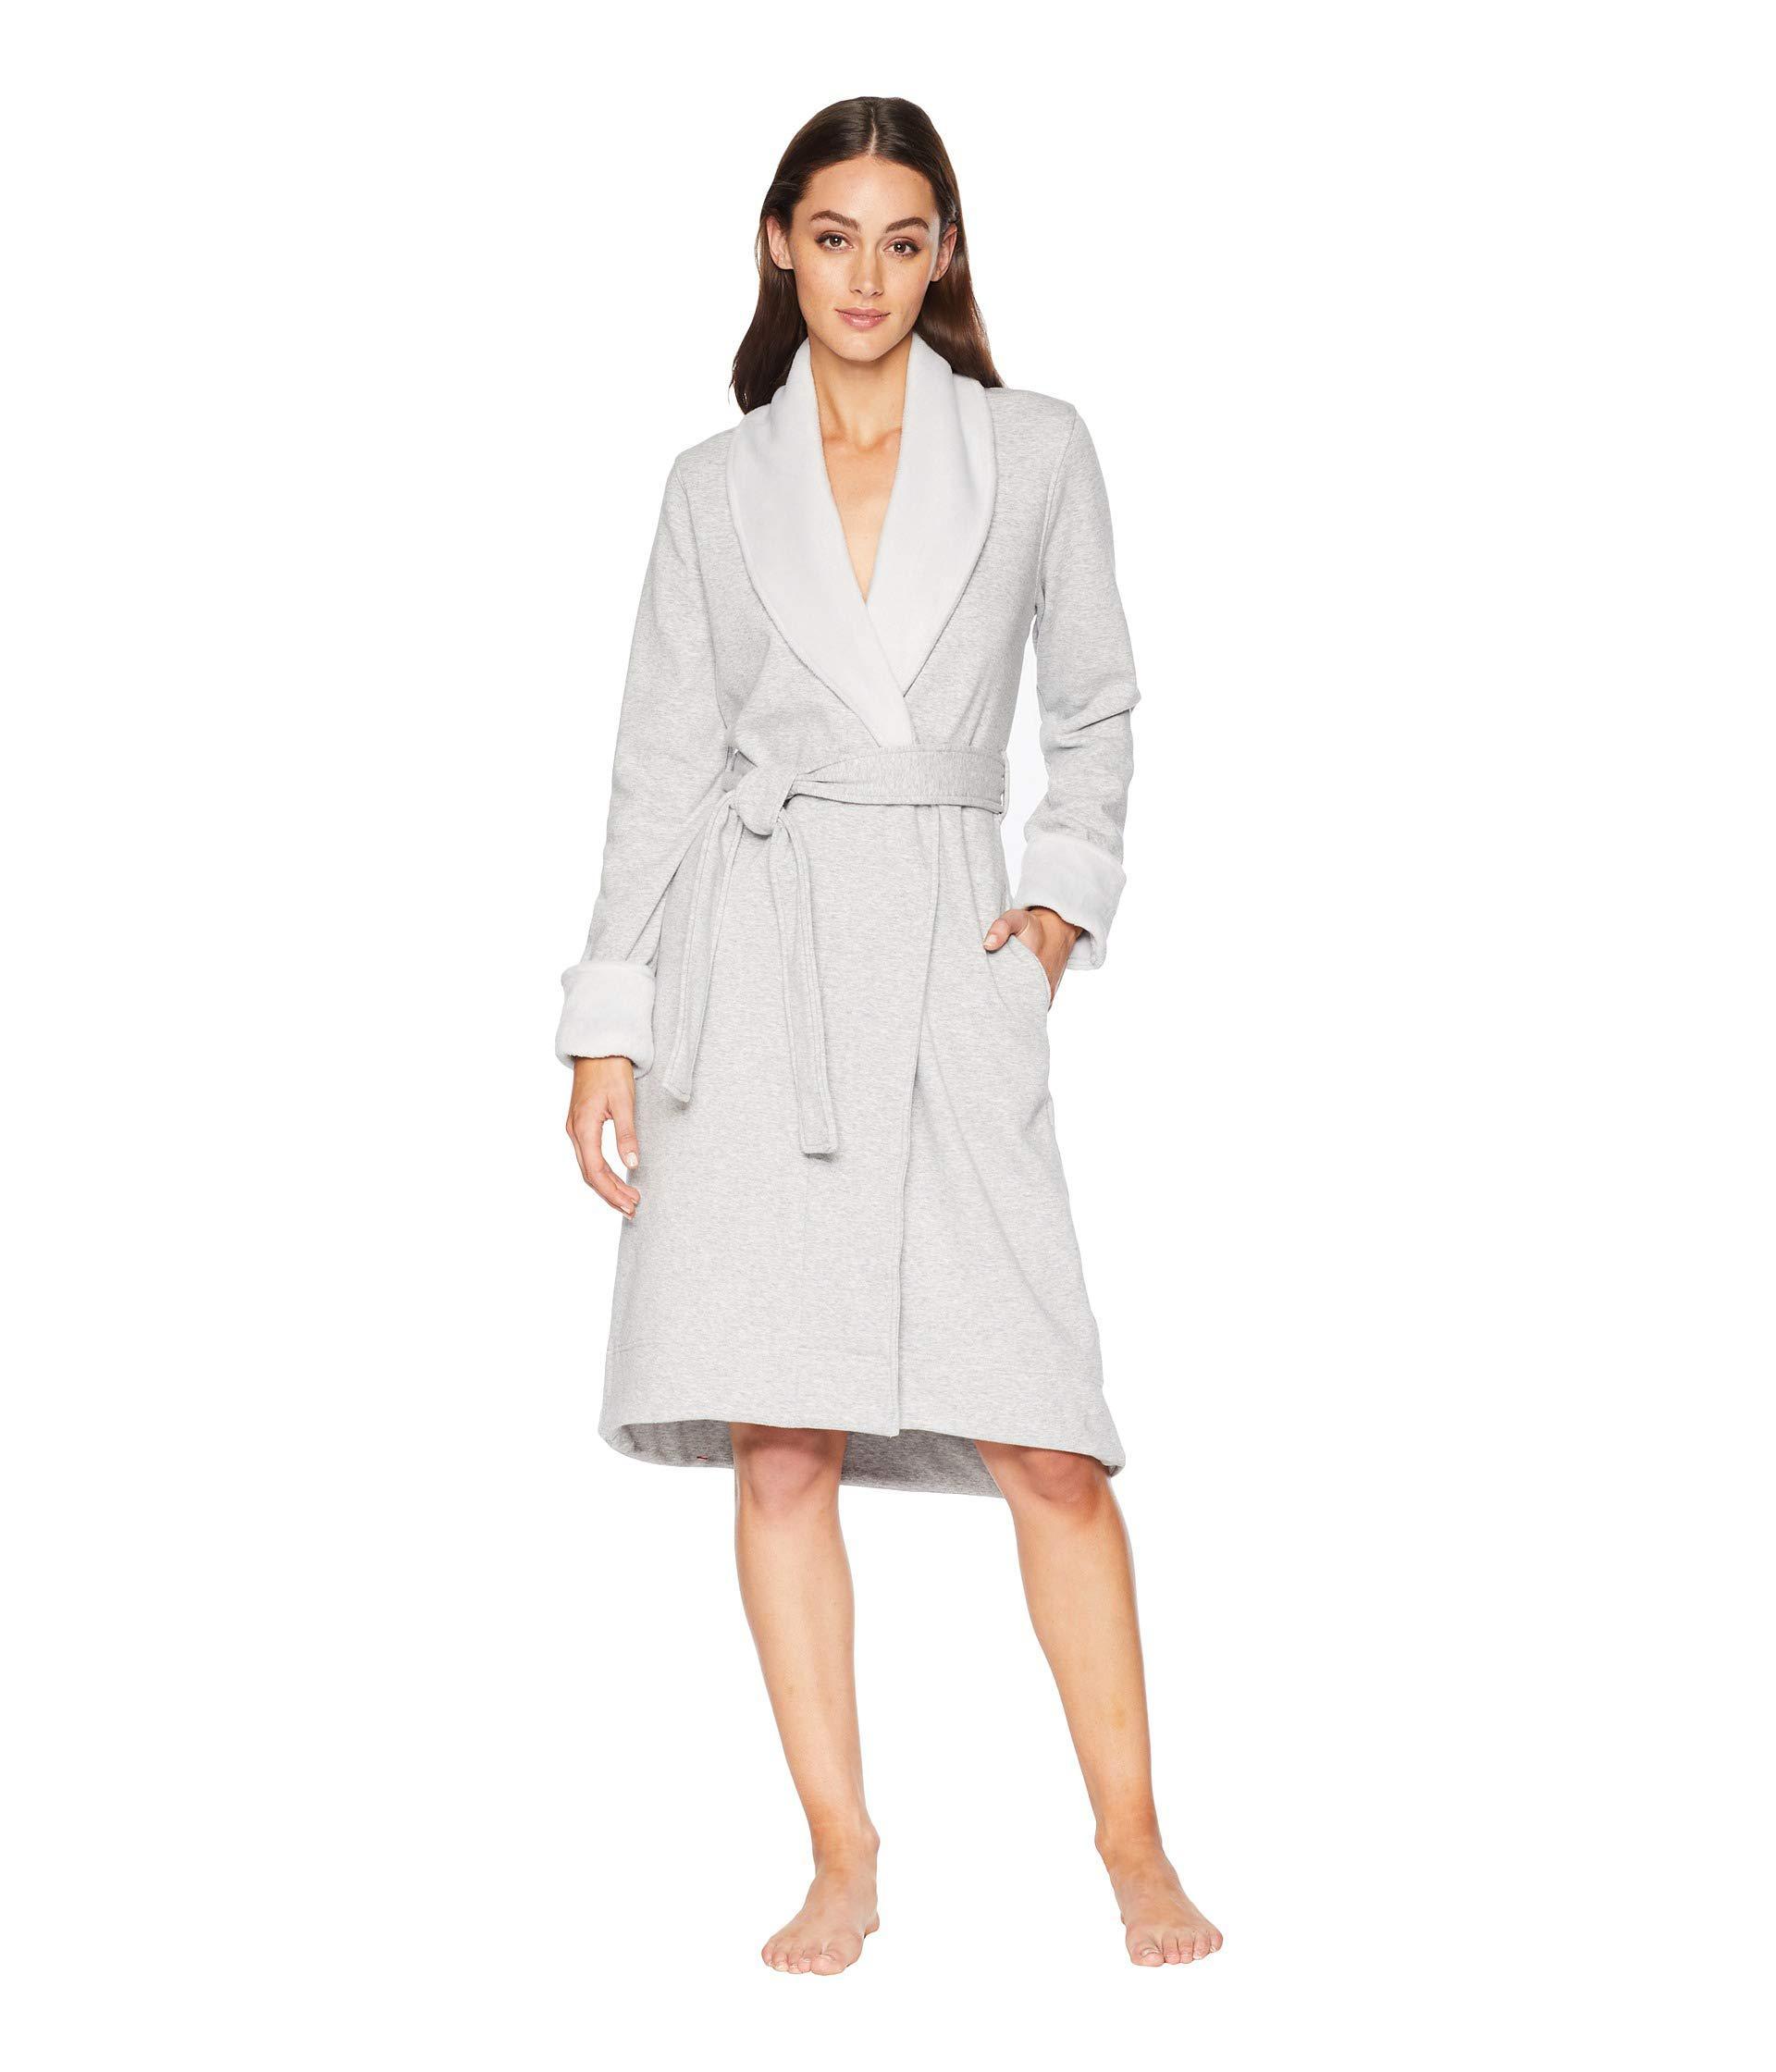 e84fecf7c2 Lyst - UGG Duffield Ii Robe (cream) Women s Robe